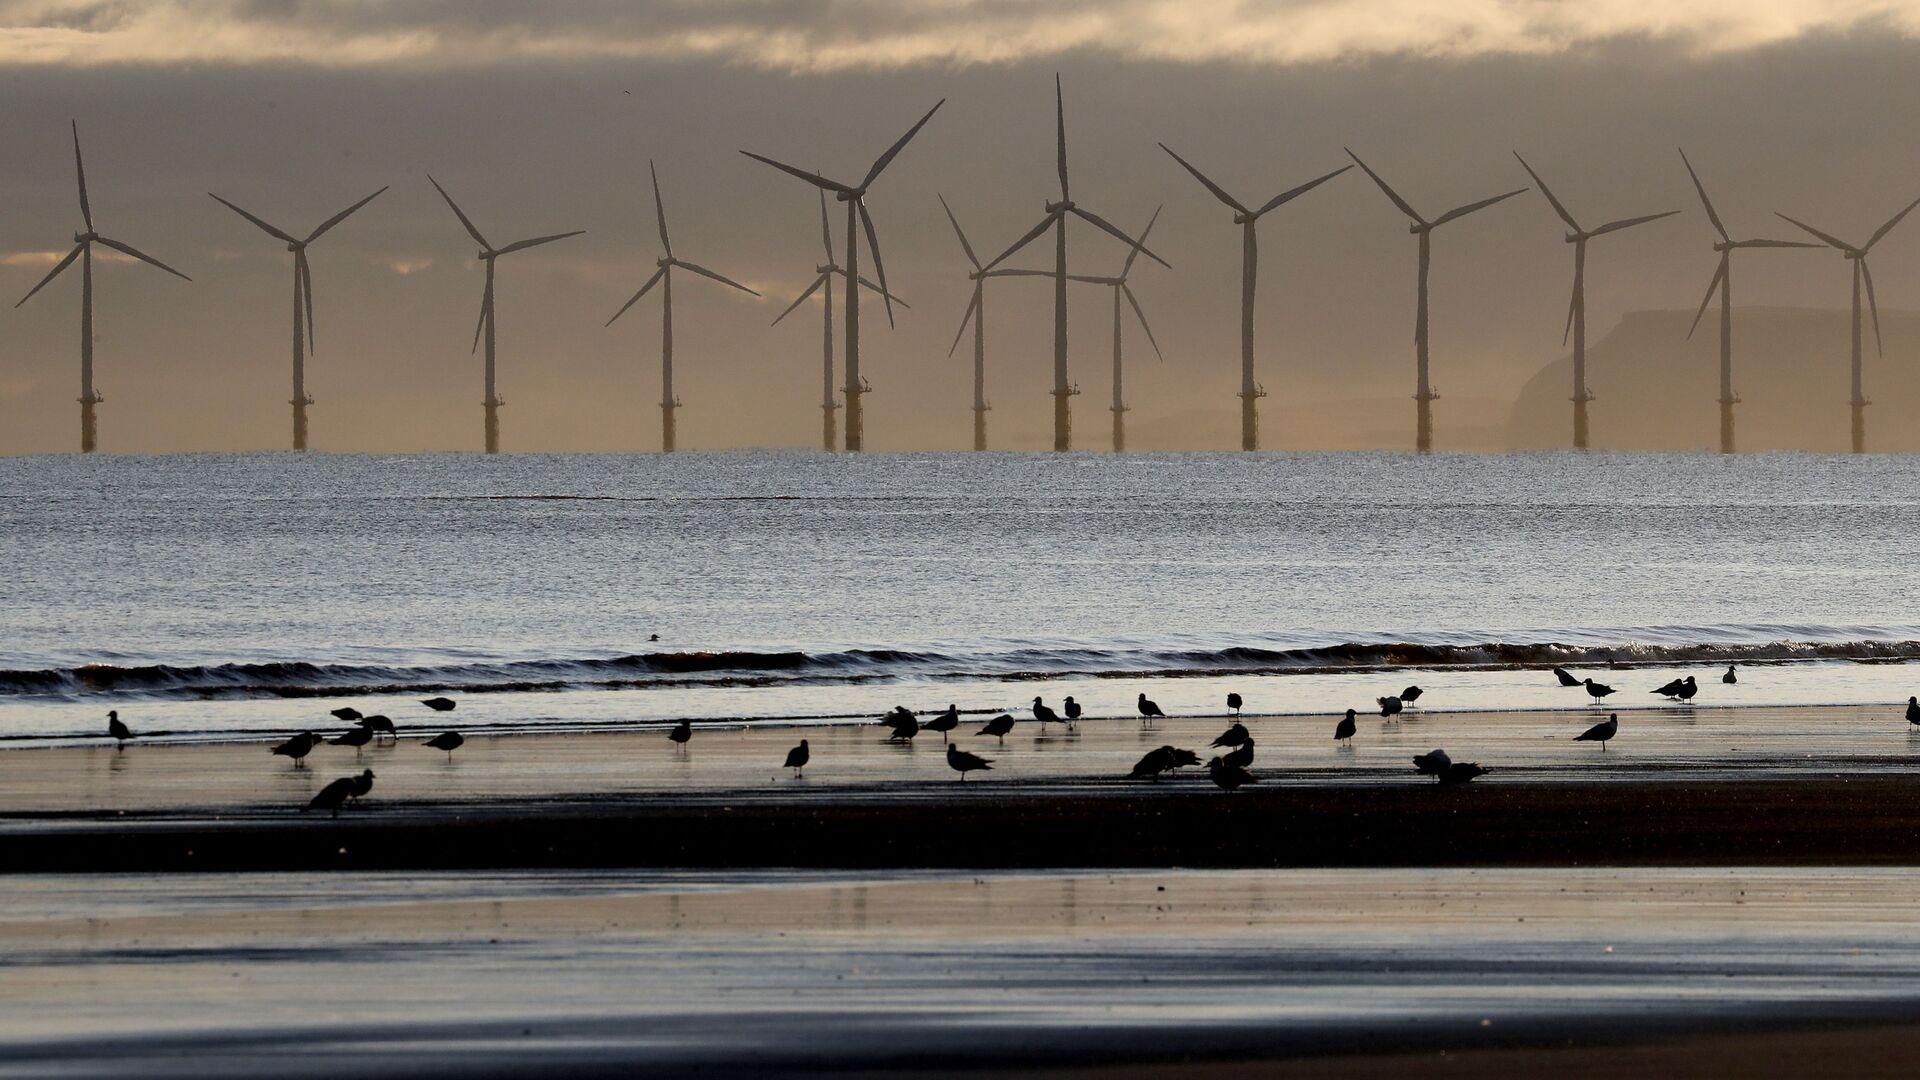 A wind farm off the coast - Sputnik International, 1920, 07.09.2021